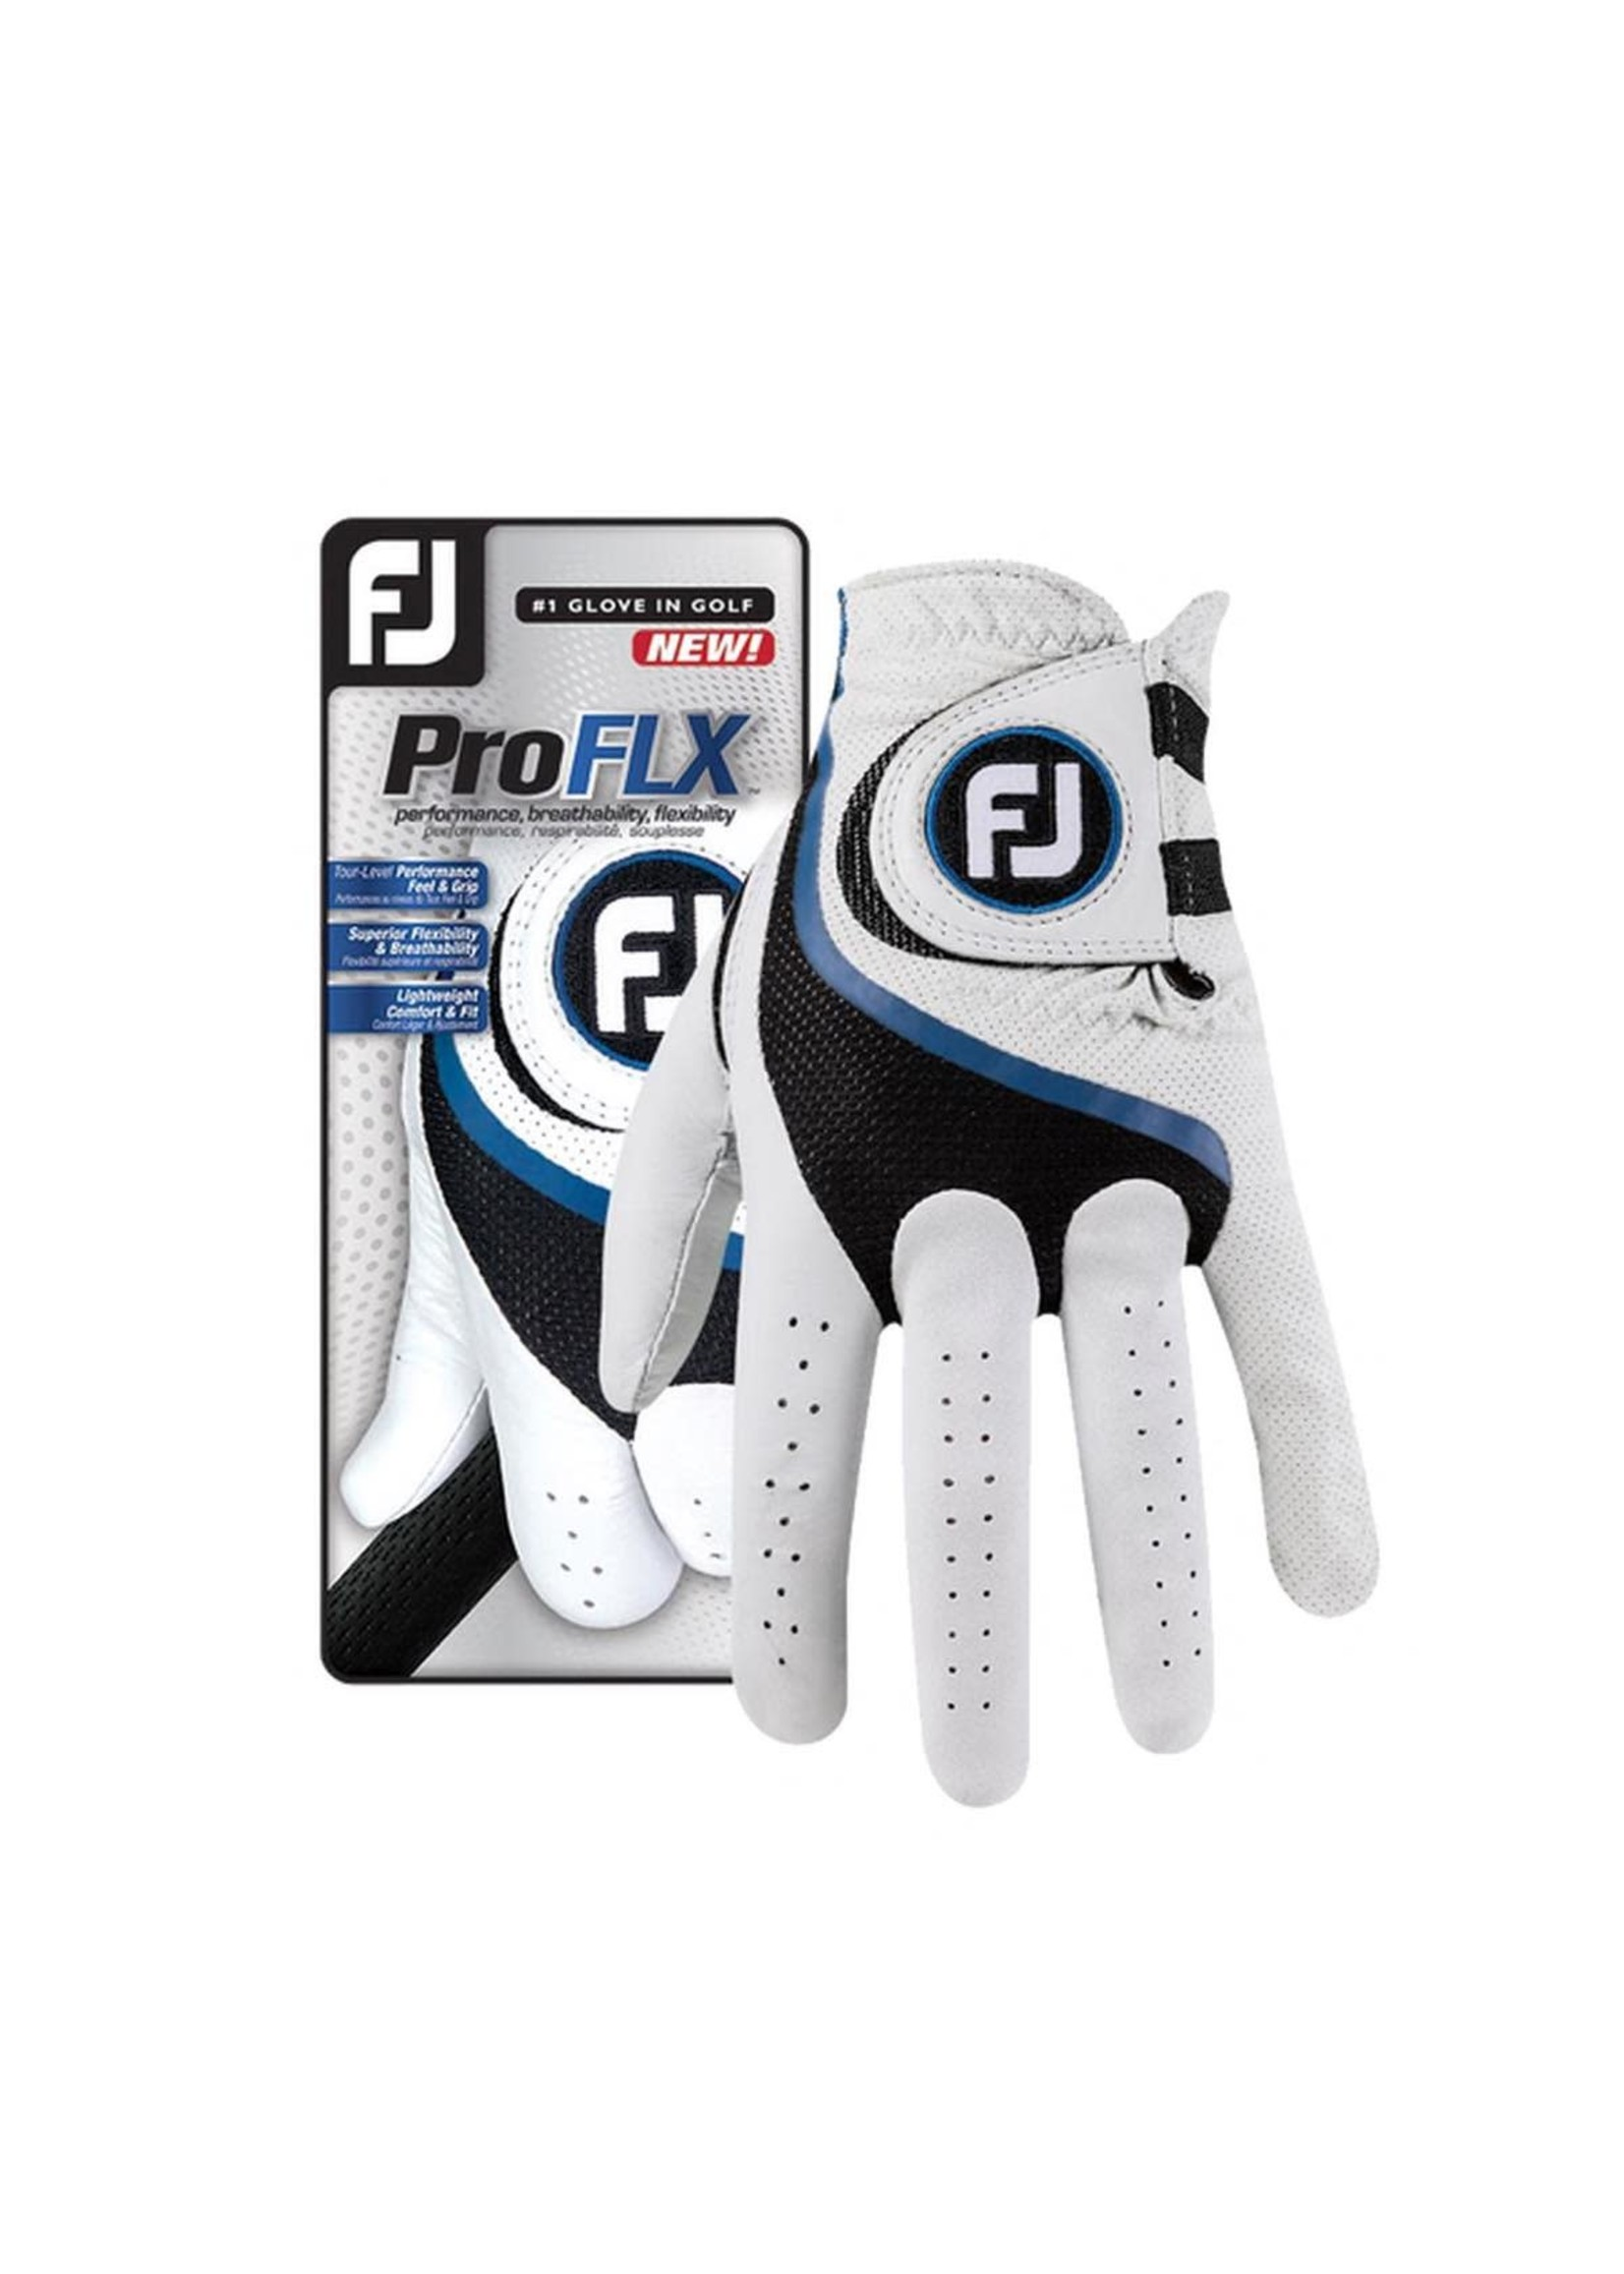 Footjoy Footjoy Pro FLX Ladies LH Golf Glove, White/Black/Blue